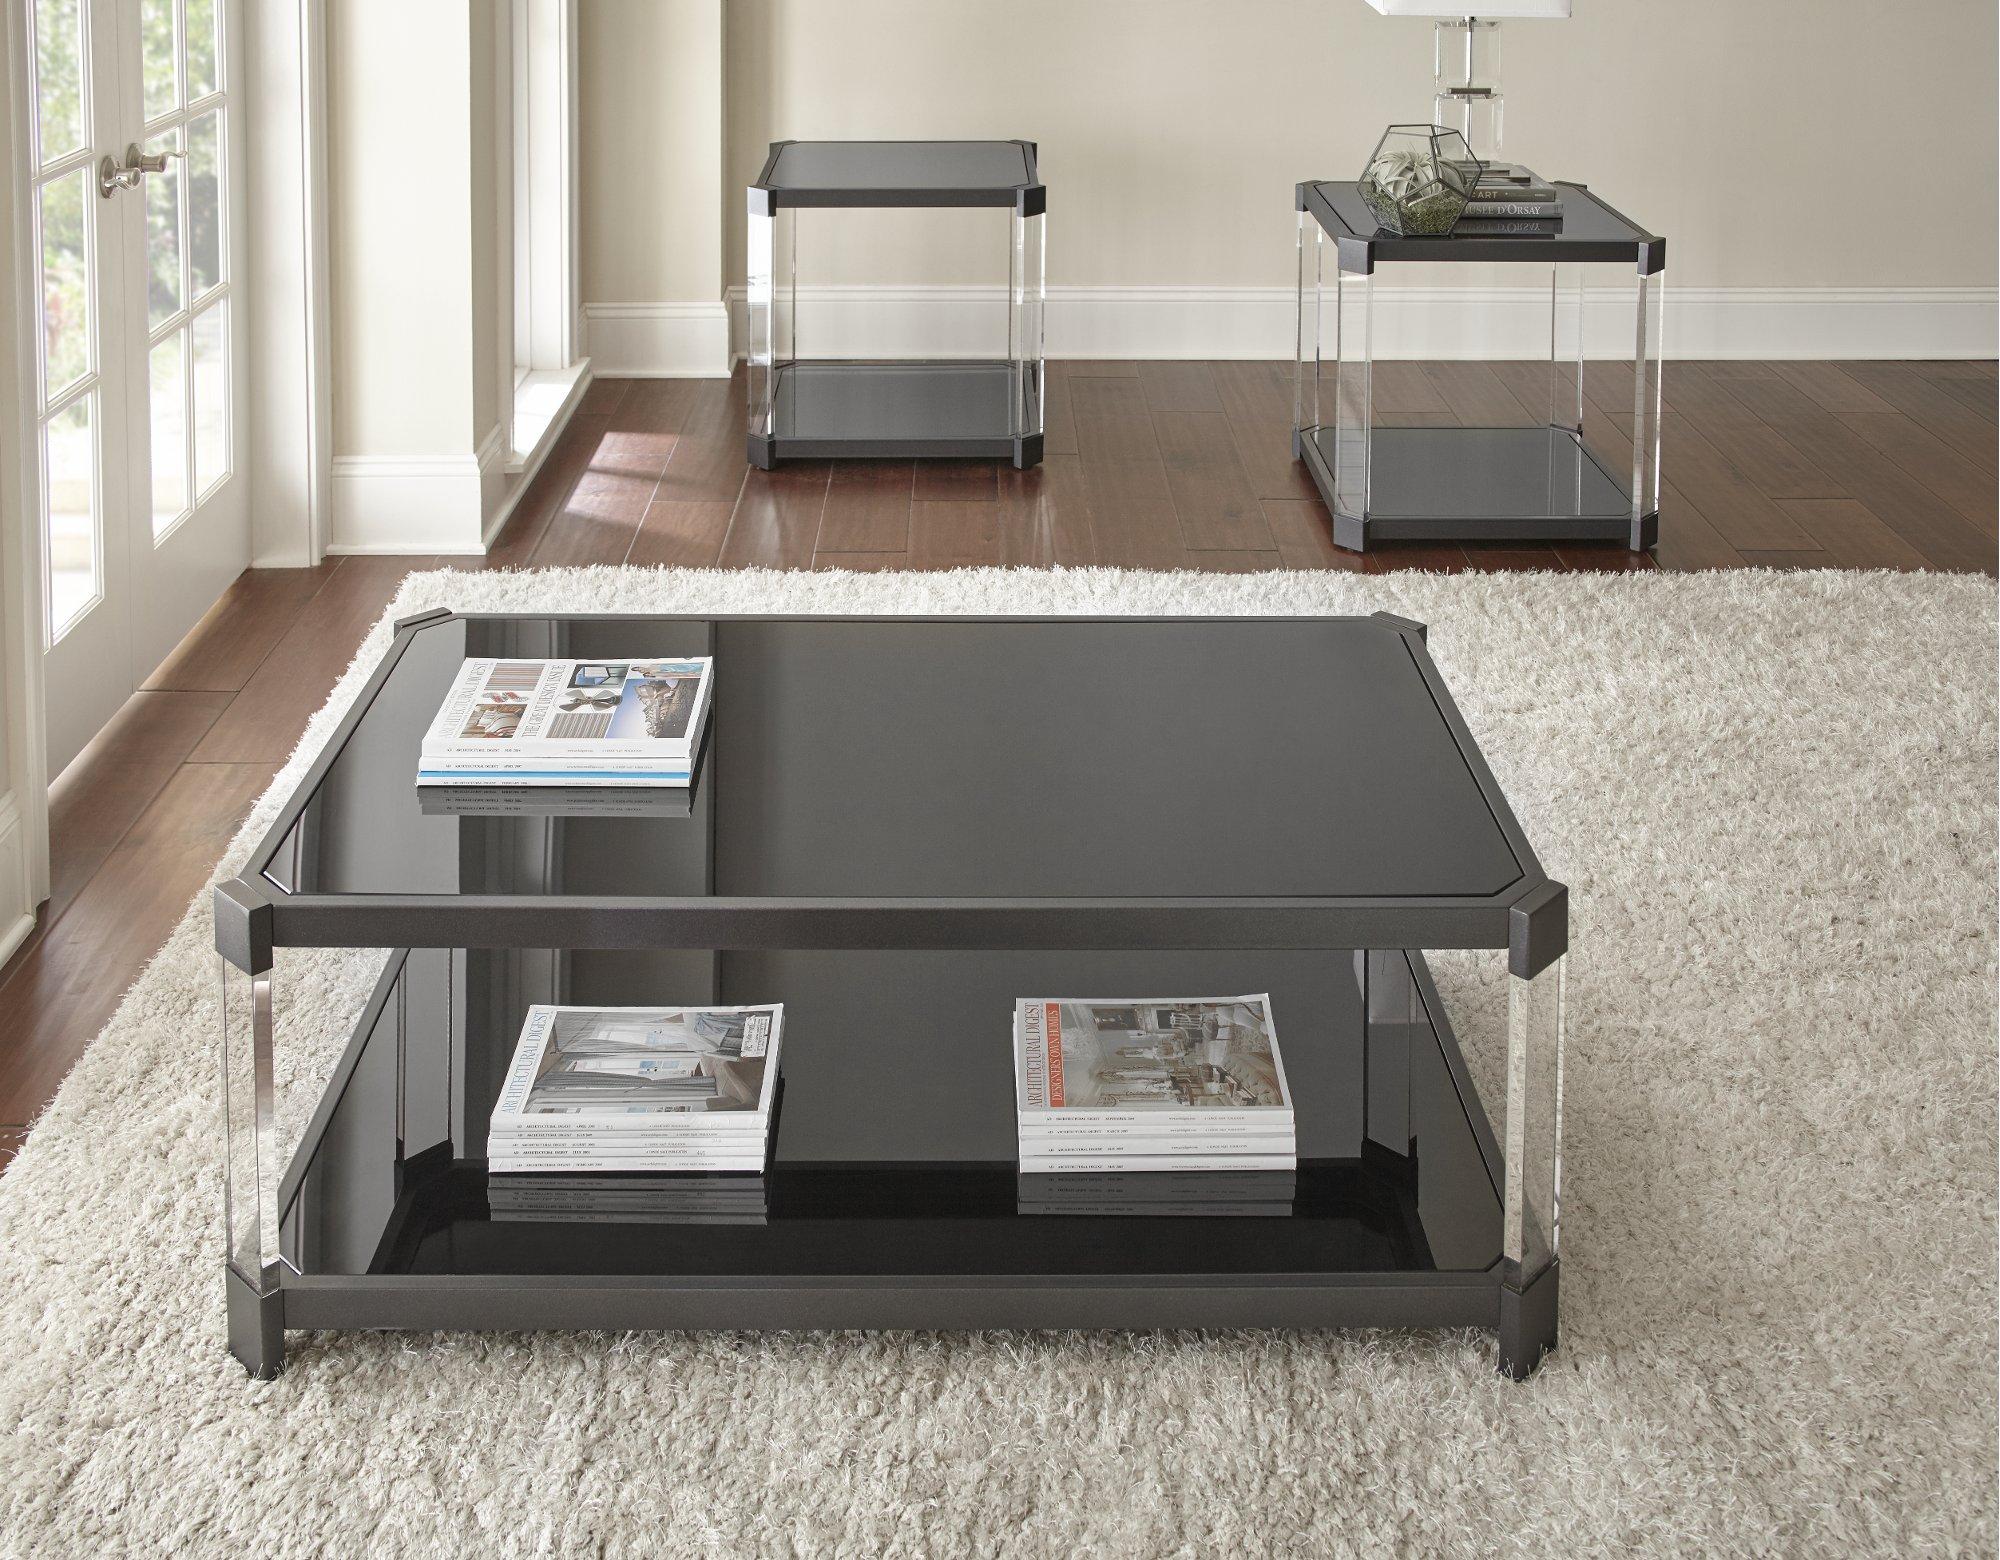 Contemporary Black Coffee Table Newton Coffee Table Black Coffee Tables Coffee Table Setting [ 1560 x 2000 Pixel ]